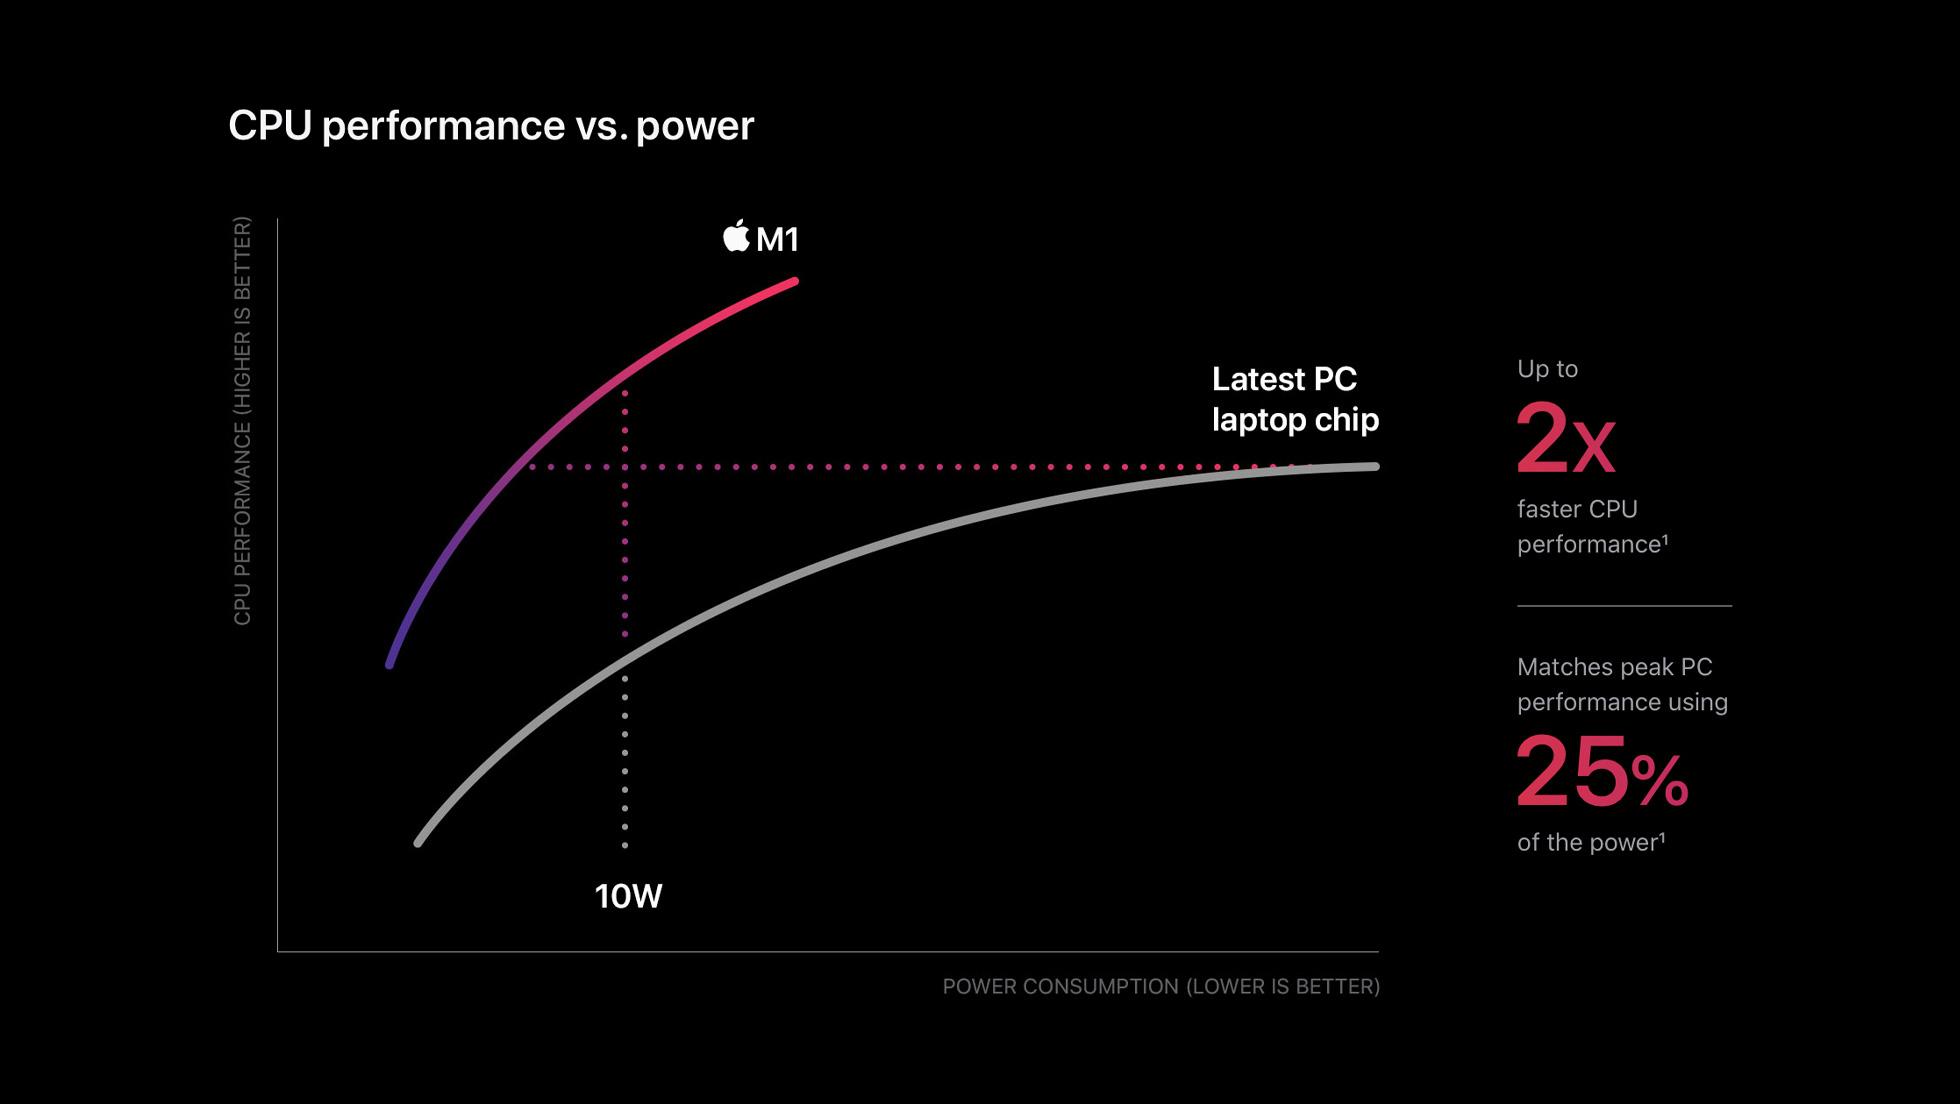 Apple_m1-chip-cpu-power-chart_11102020.jpg